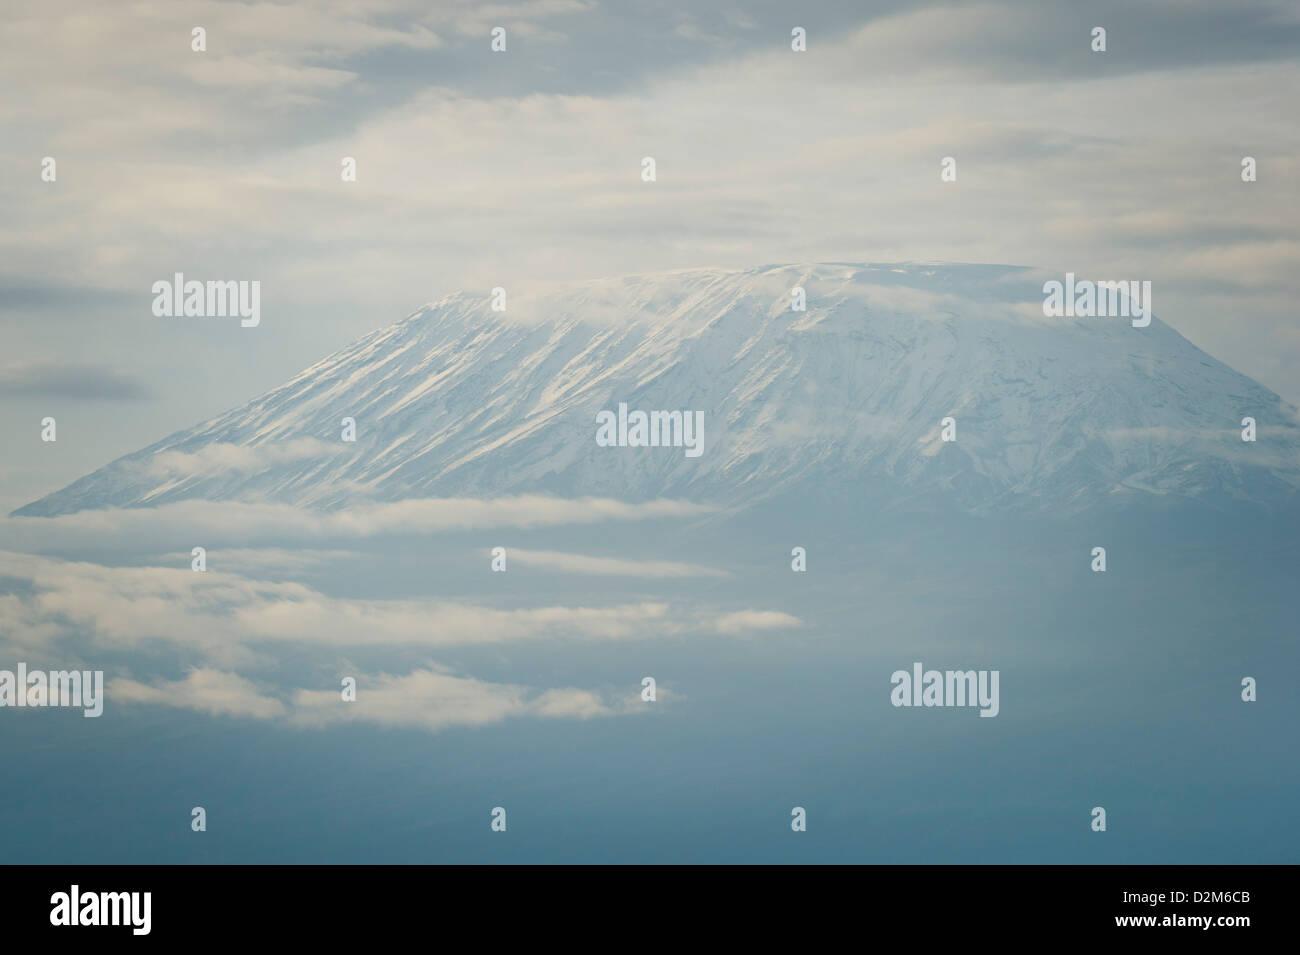 Mount Kilimanjaro, Amboseli National Park, Kenya - Stock Image